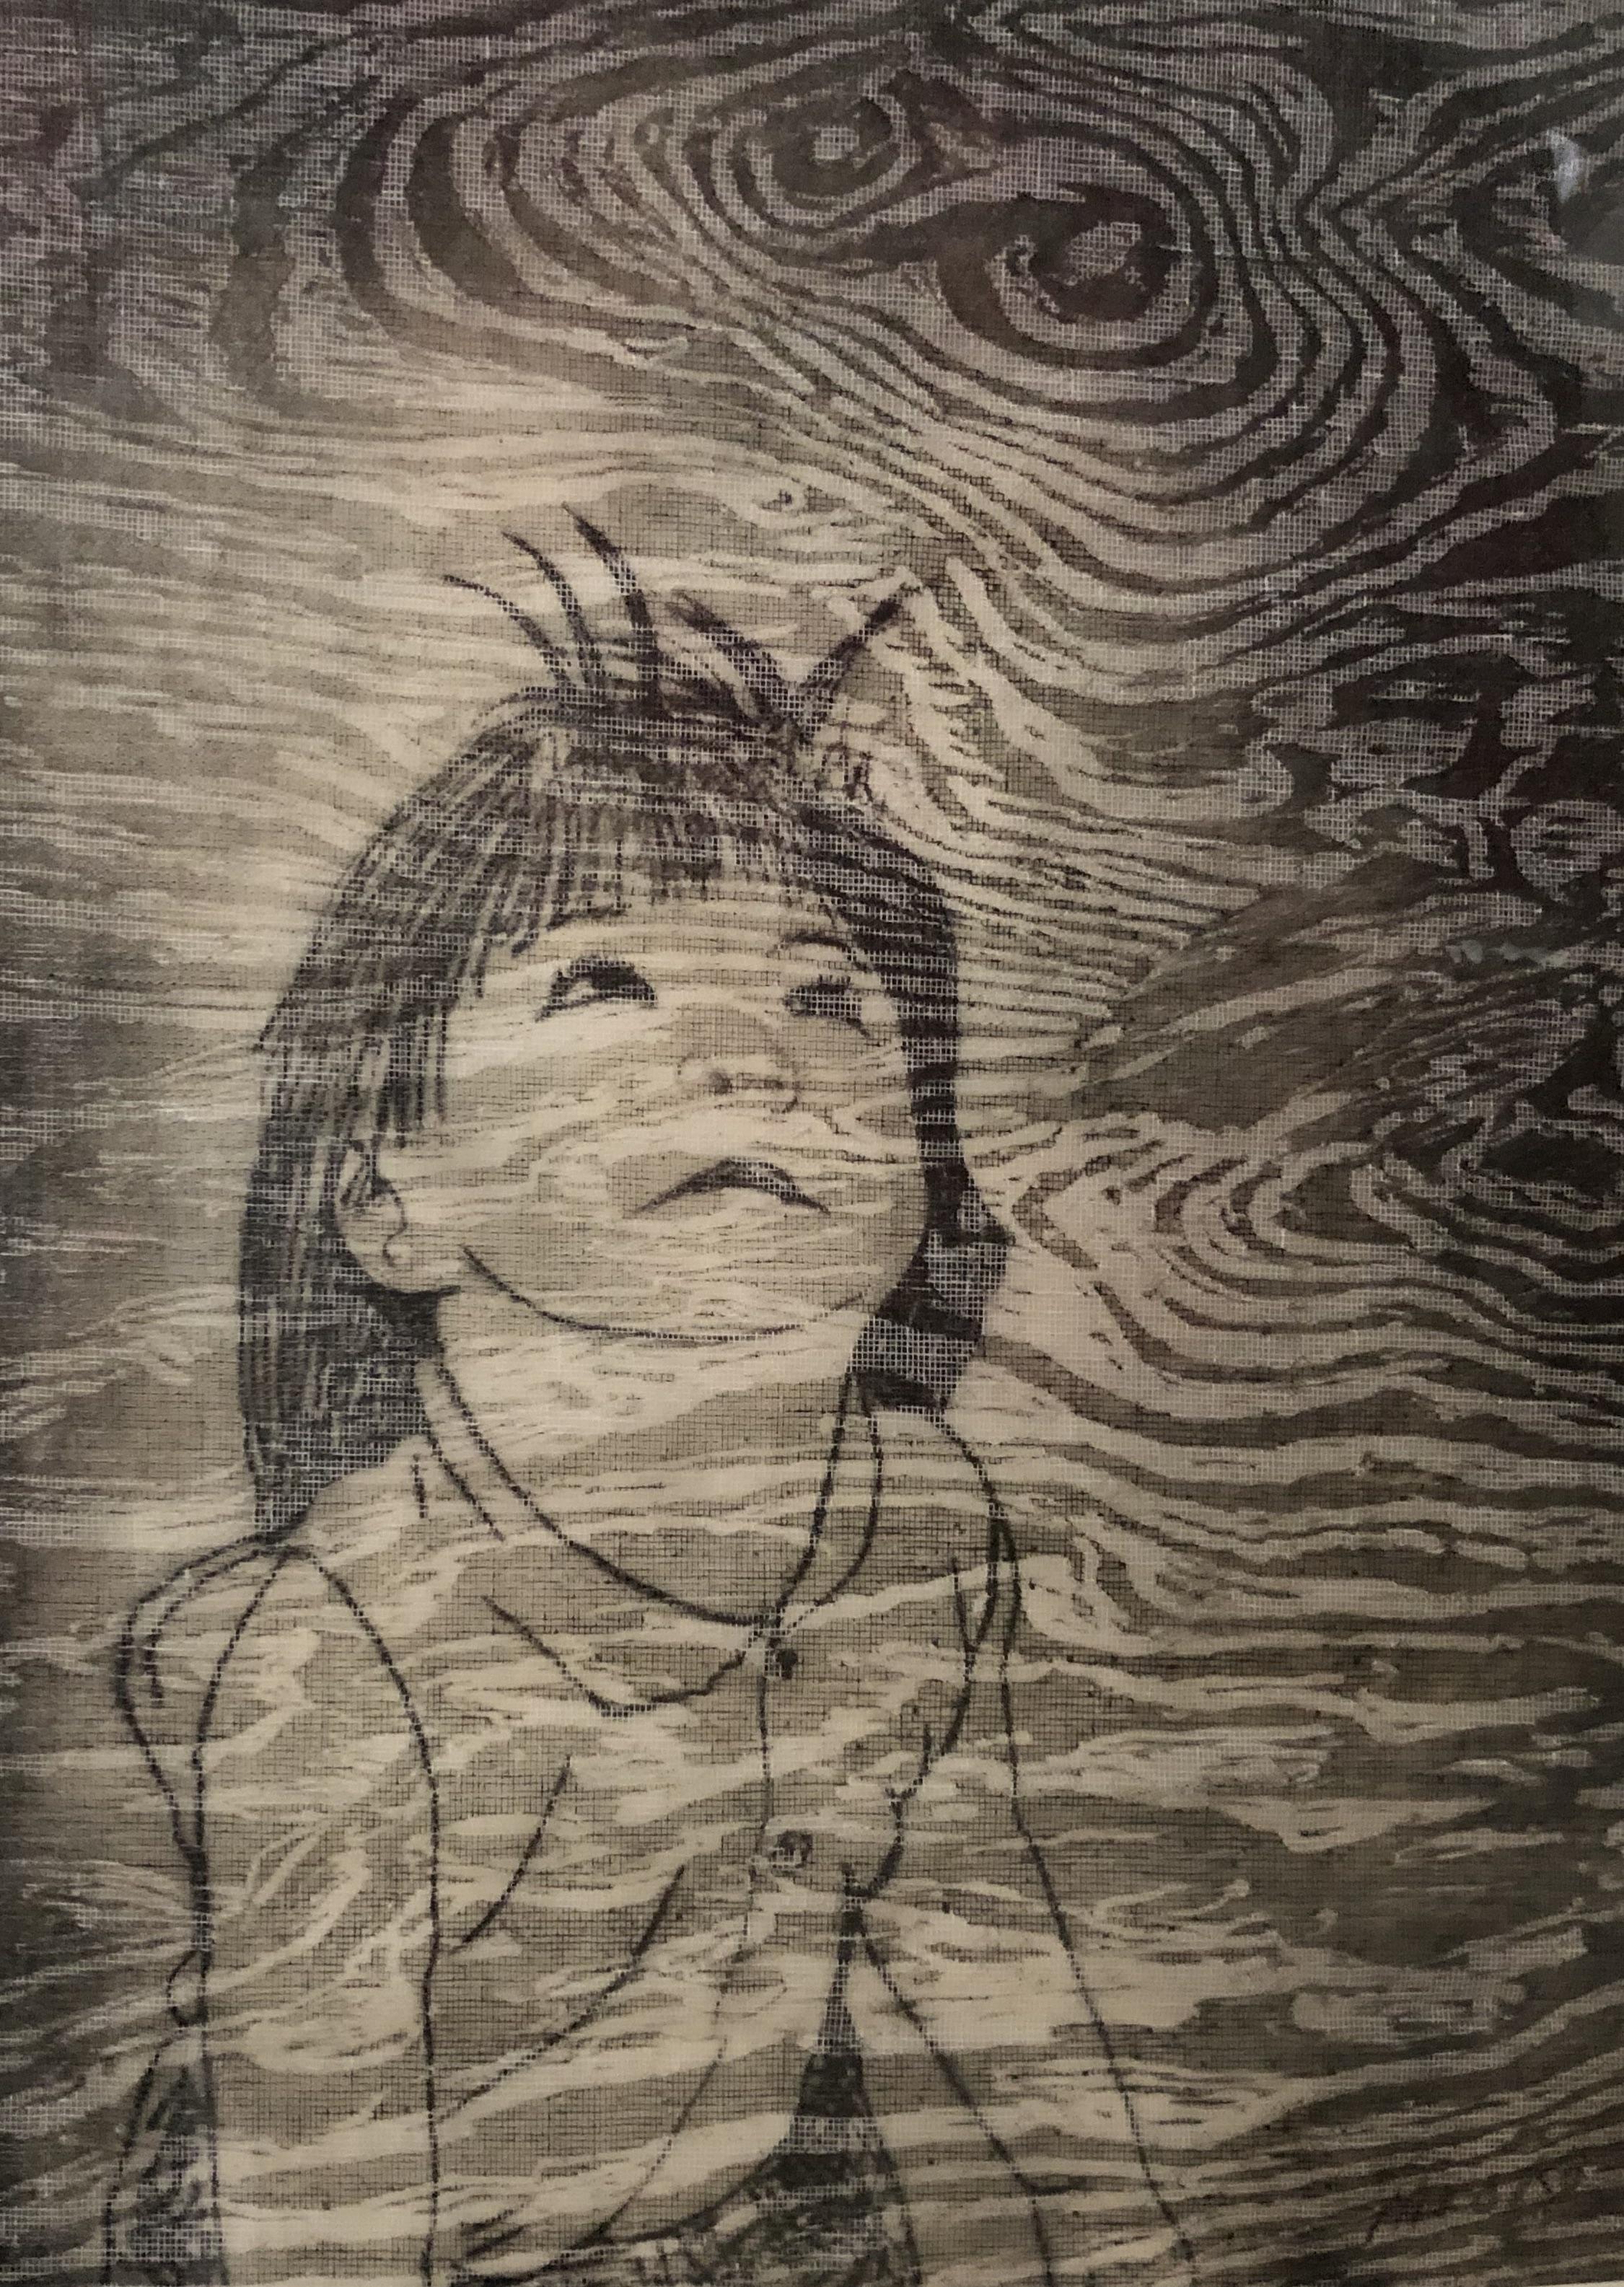 Looking Up, woodcut